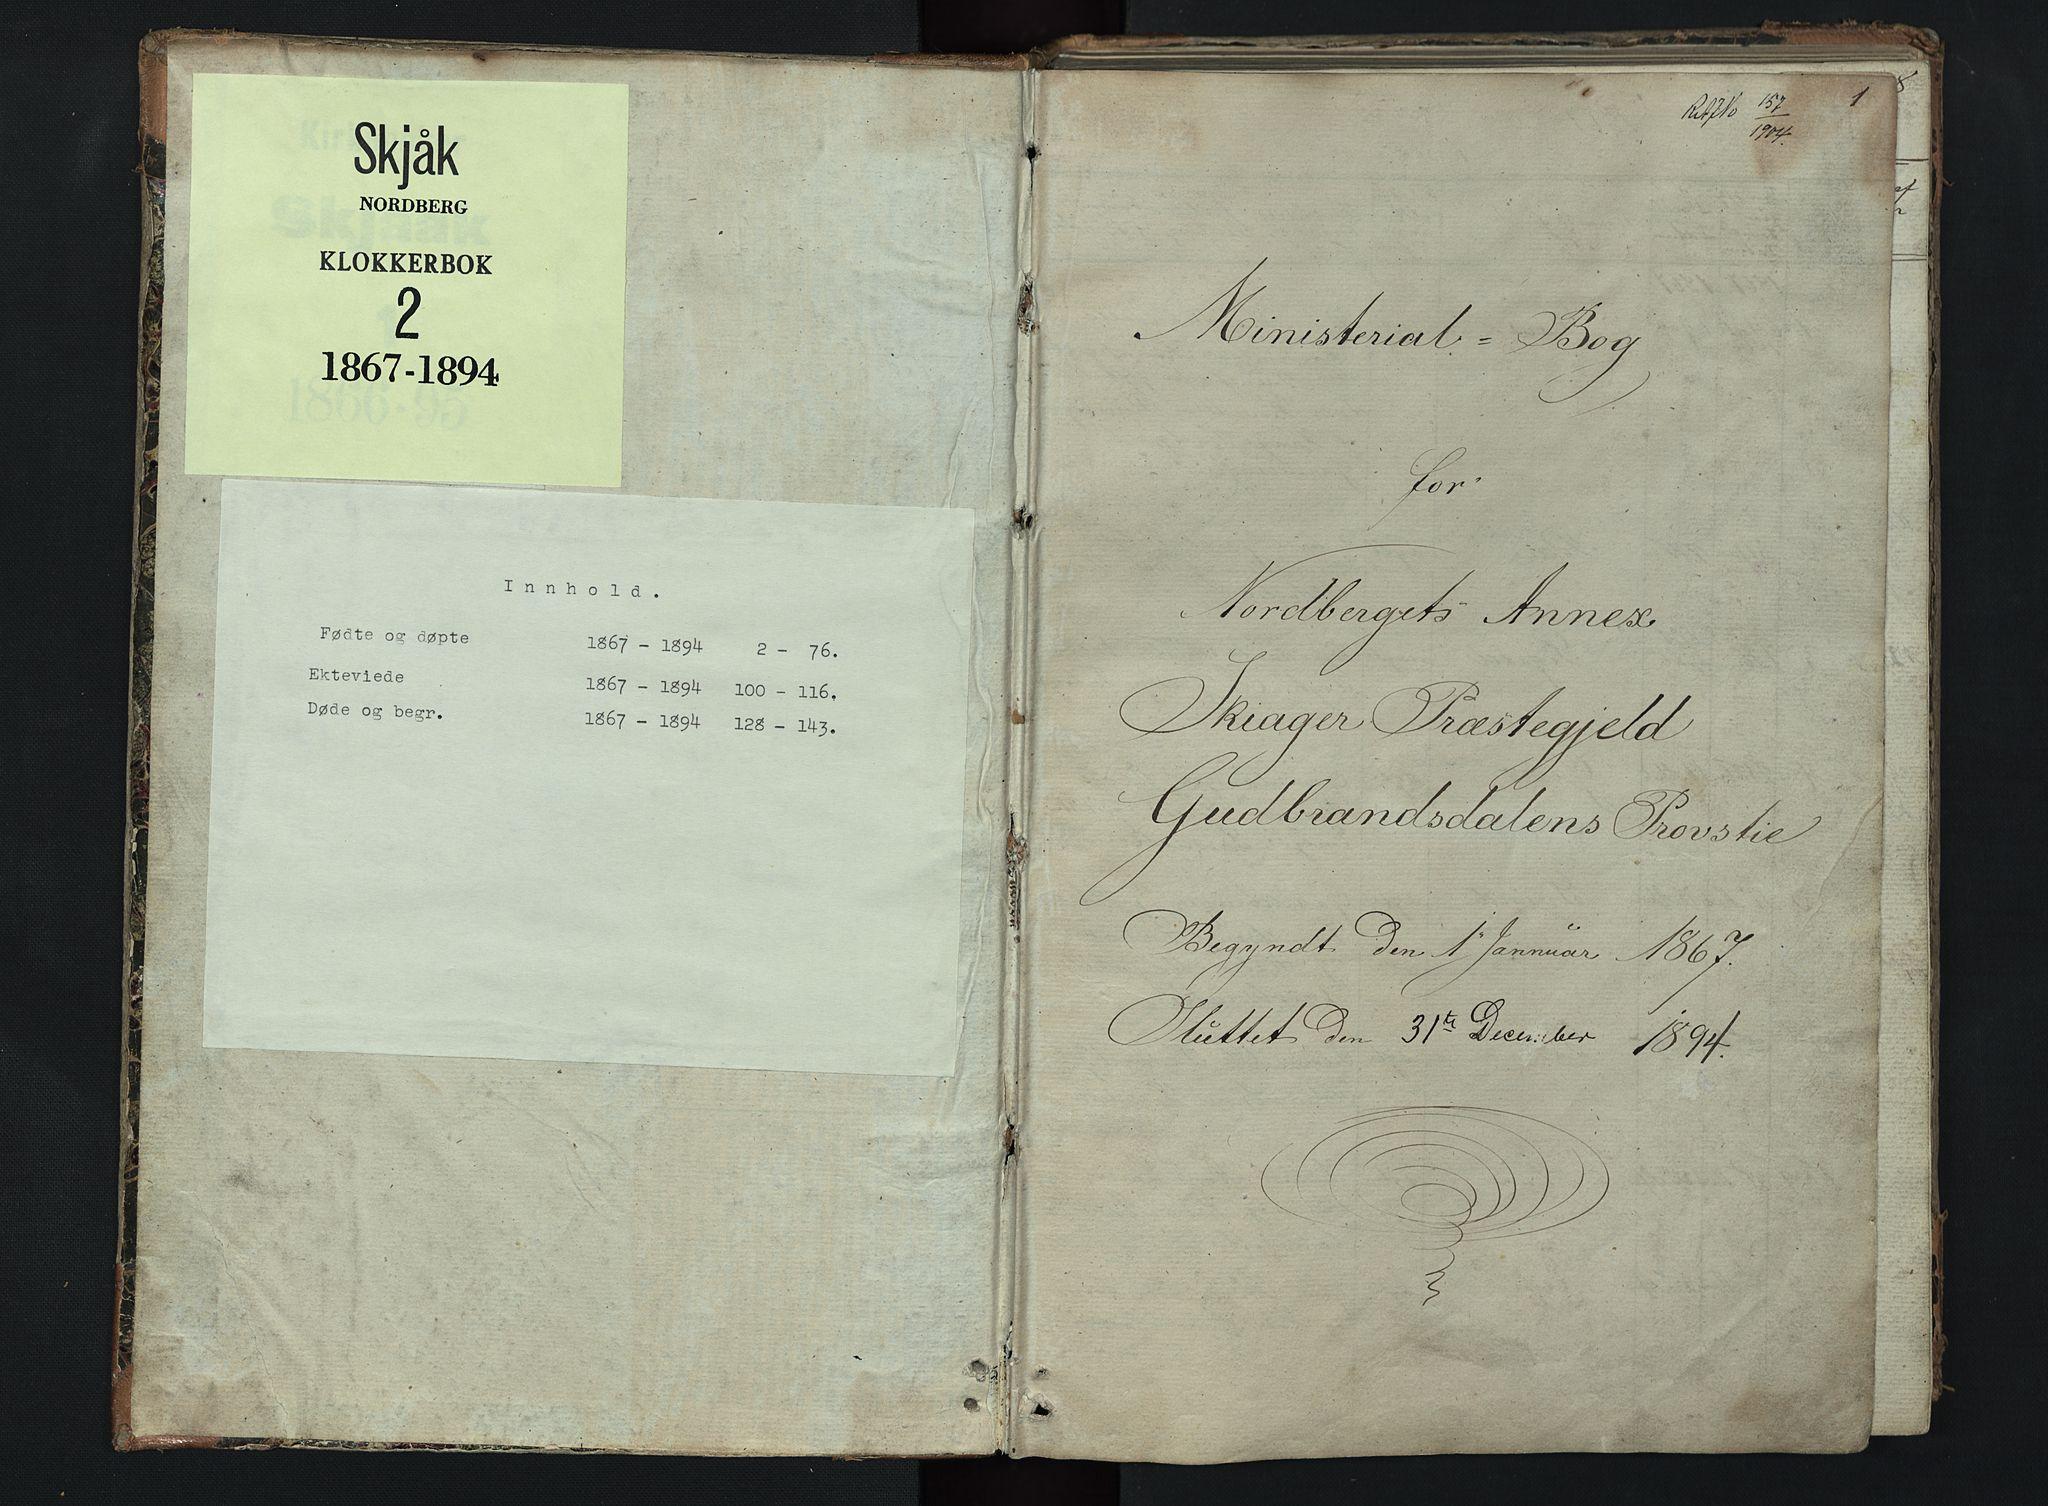 SAH, Skjåk prestekontor, Klokkerbok nr. 2, 1867-1894, s. 1